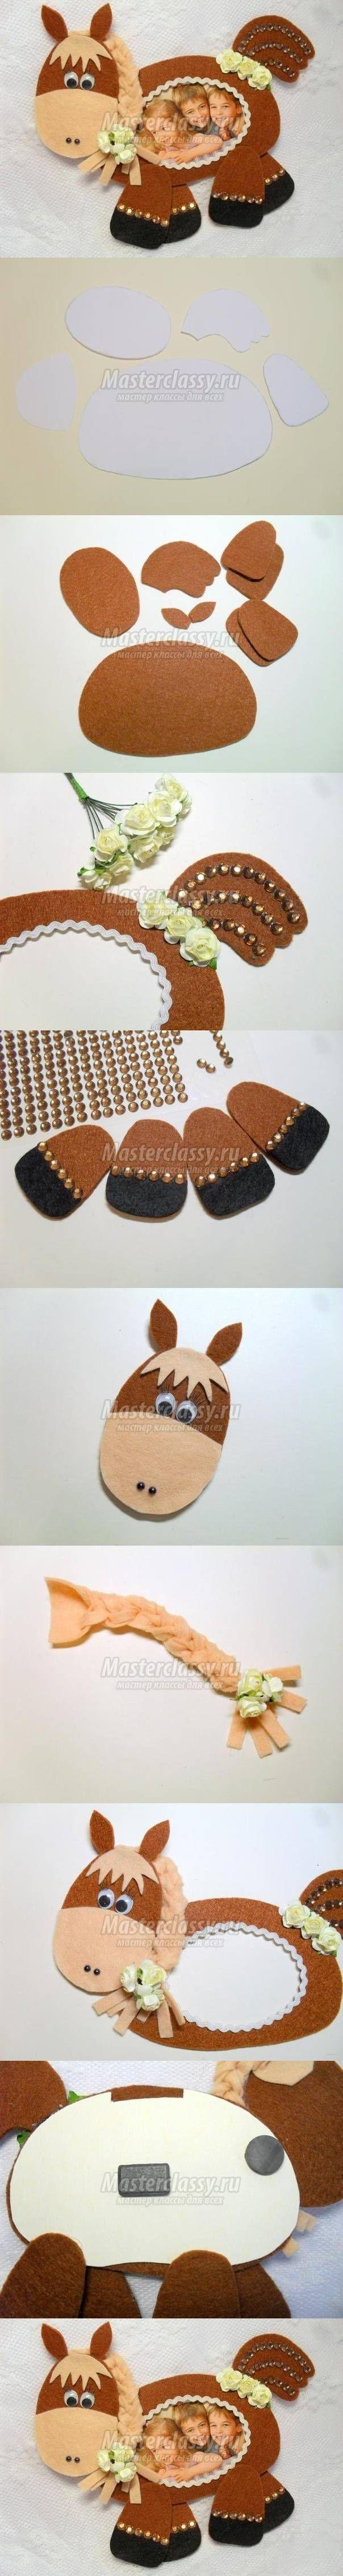 DIY Felt Horse Picture Frame DIY Projects | UsefulDIY.com Follow Us on Facebook ==> http://www.facebook.com/UsefulDiy